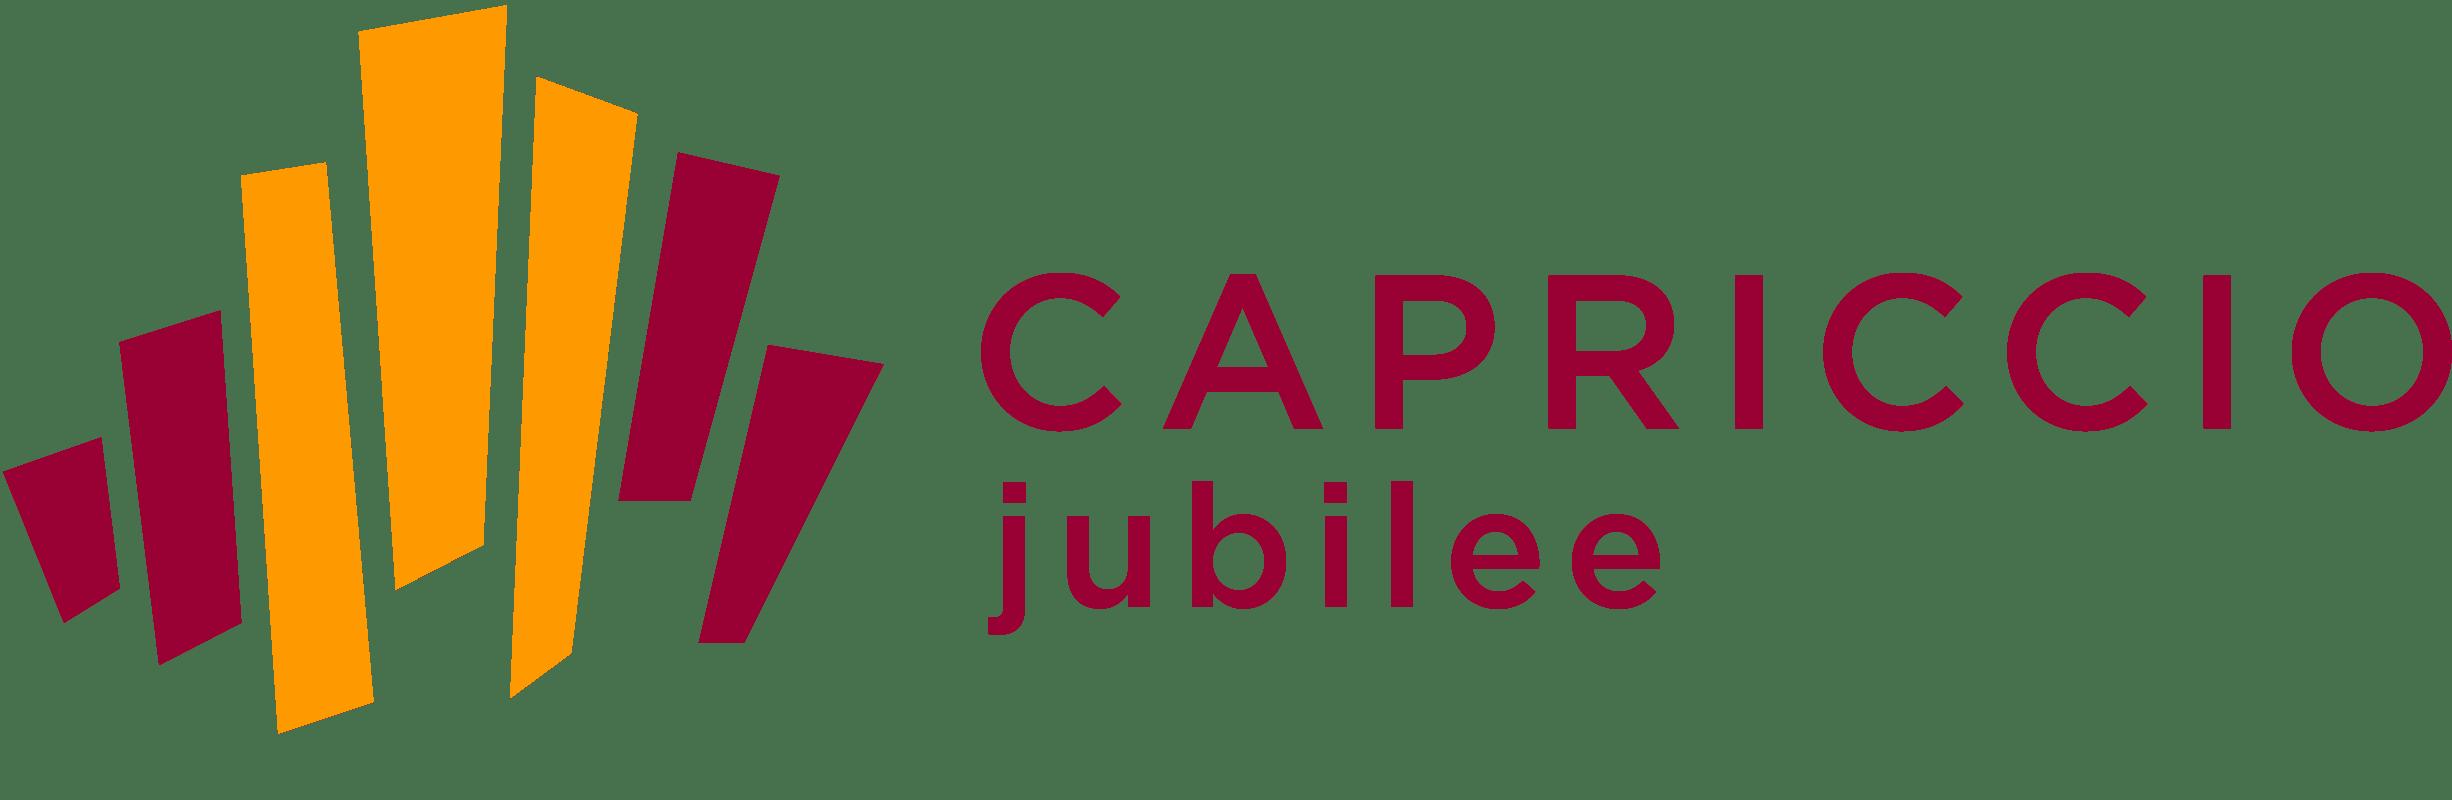 jubilee-horizontal-FC